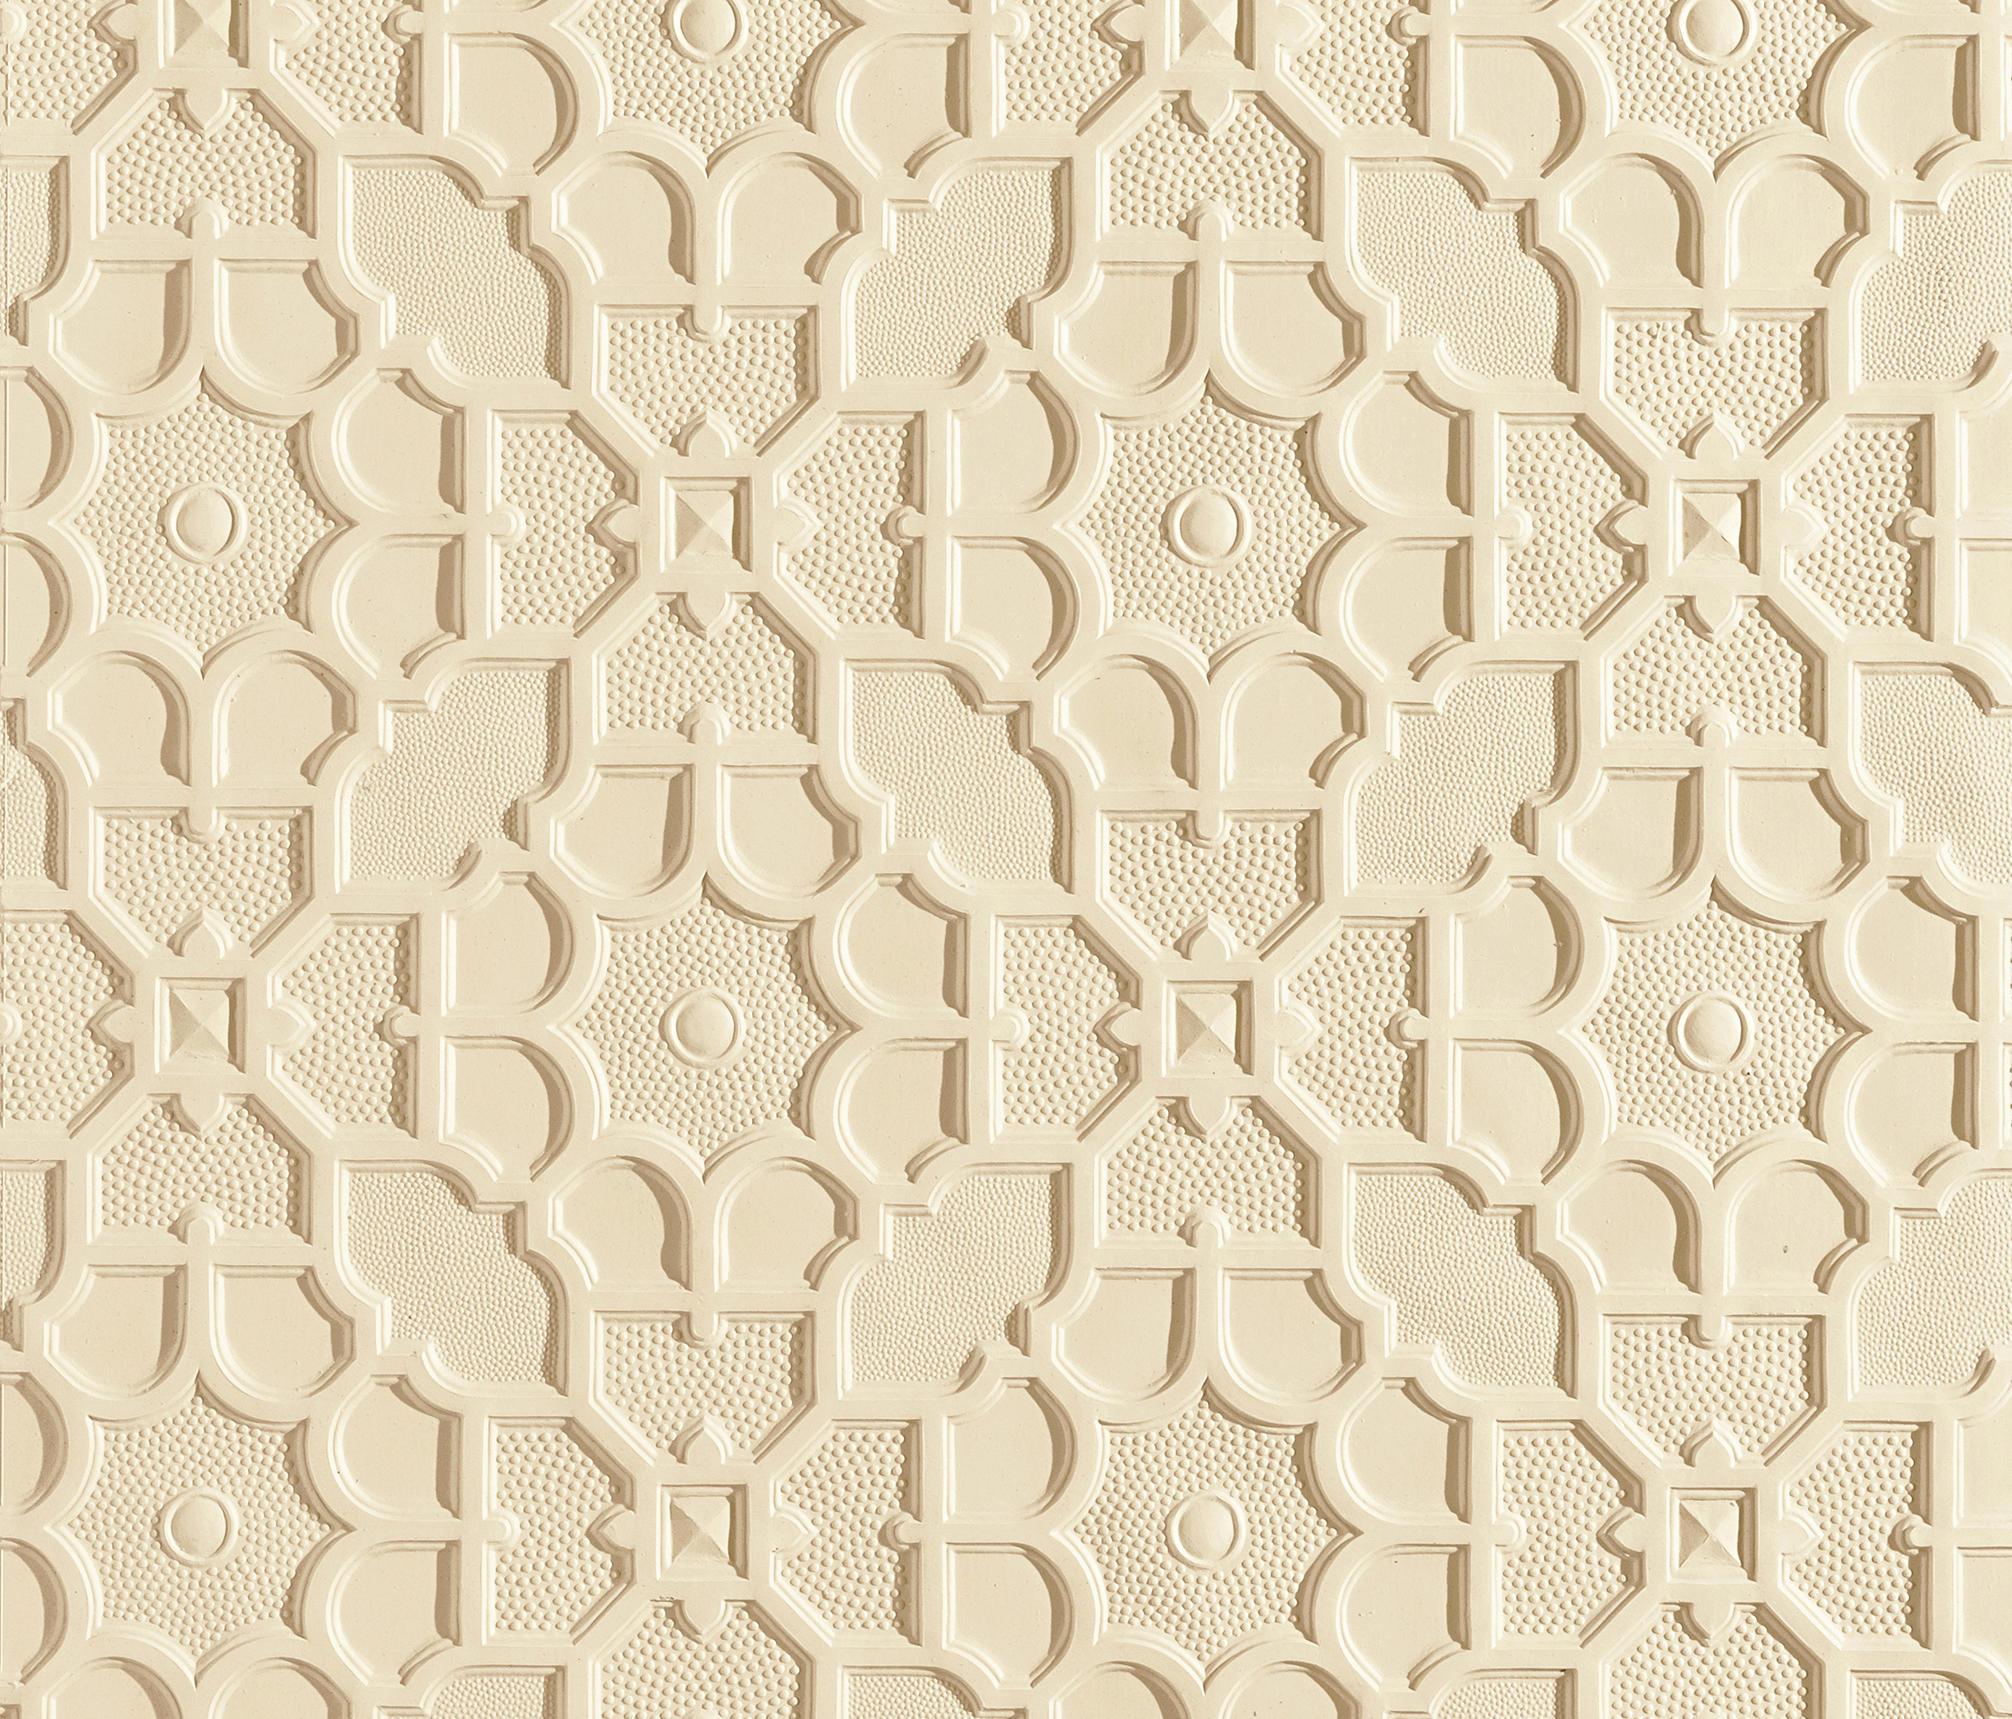 elizabeth - tissus de décoration de lincrusta | architonic